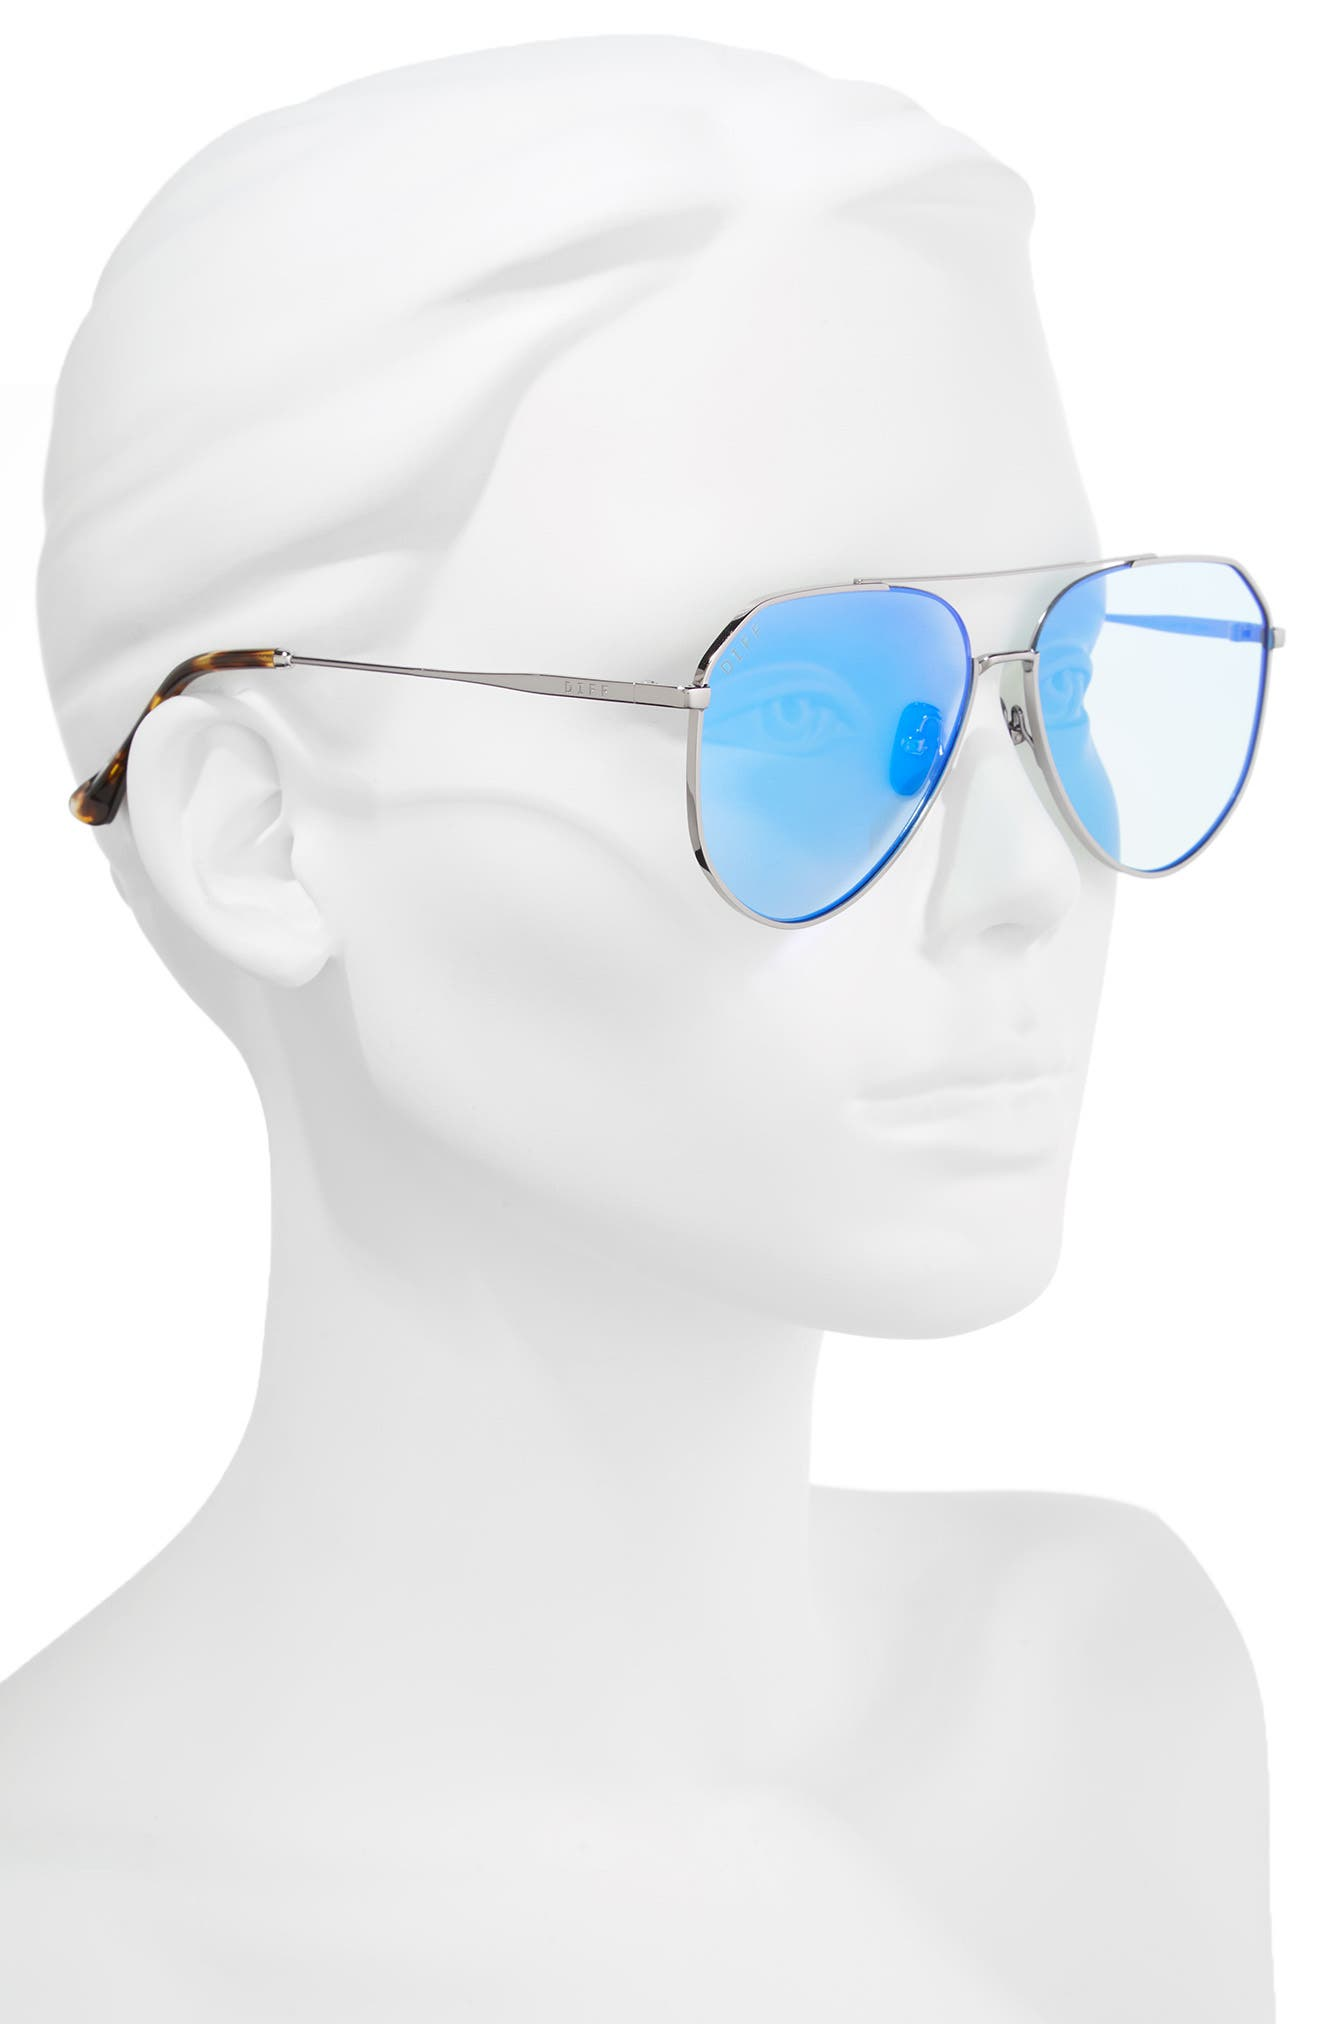 Dash 61mm Polarized Aviator Sunglasses,                             Alternate thumbnail 2, color,                             GUNMETAL/ ICE BLUE